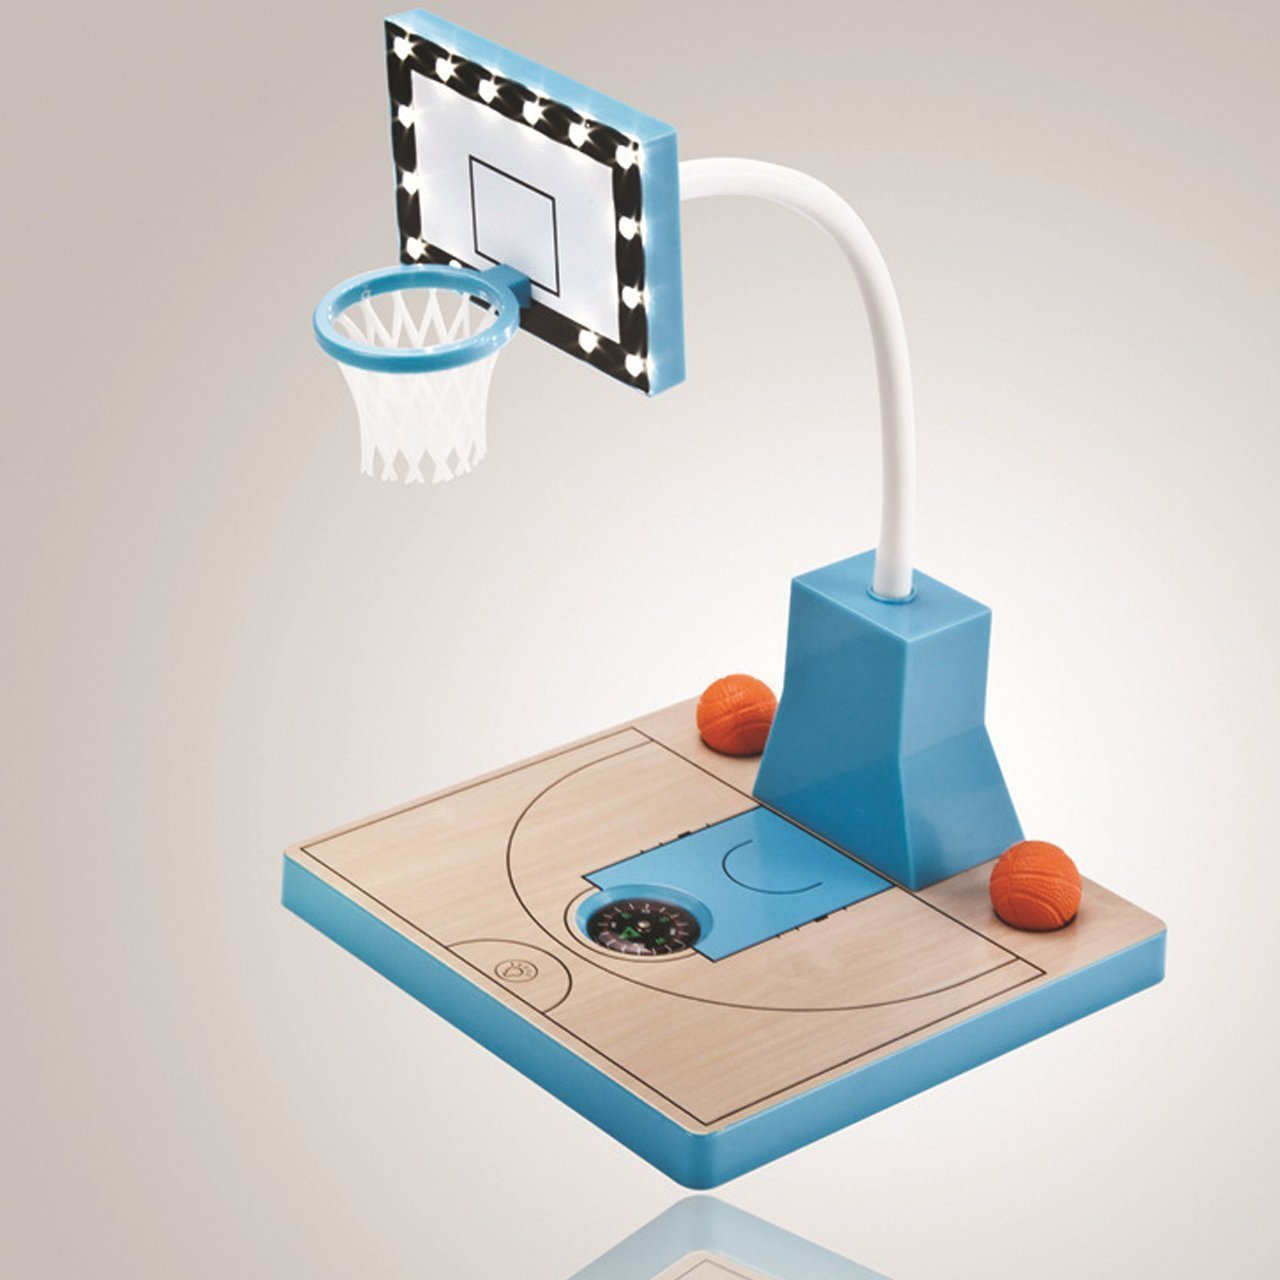 Basketball Stand Desk Lamp by Haixiang,12 LED Bulbs 1 Watt Table Lamp,Rechargeable USB Sports Basketball Lamp (Blue)